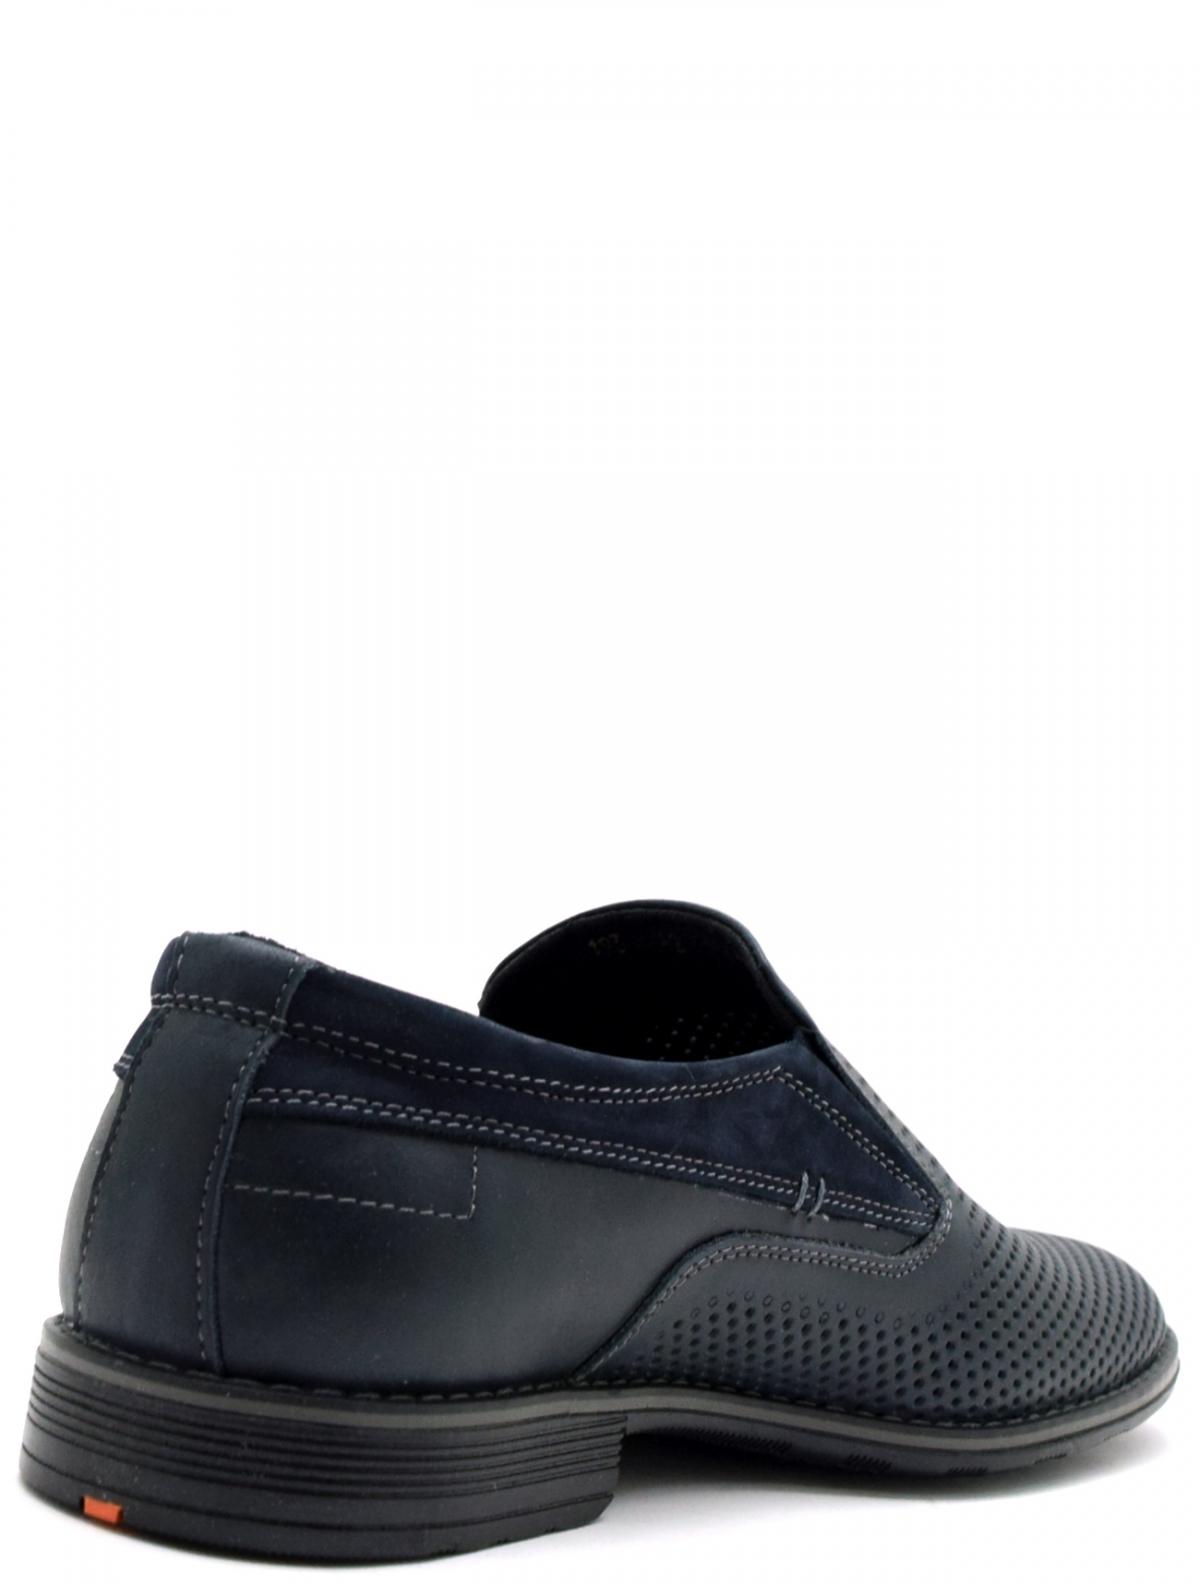 BERTOLI 193/24П мужские туфли